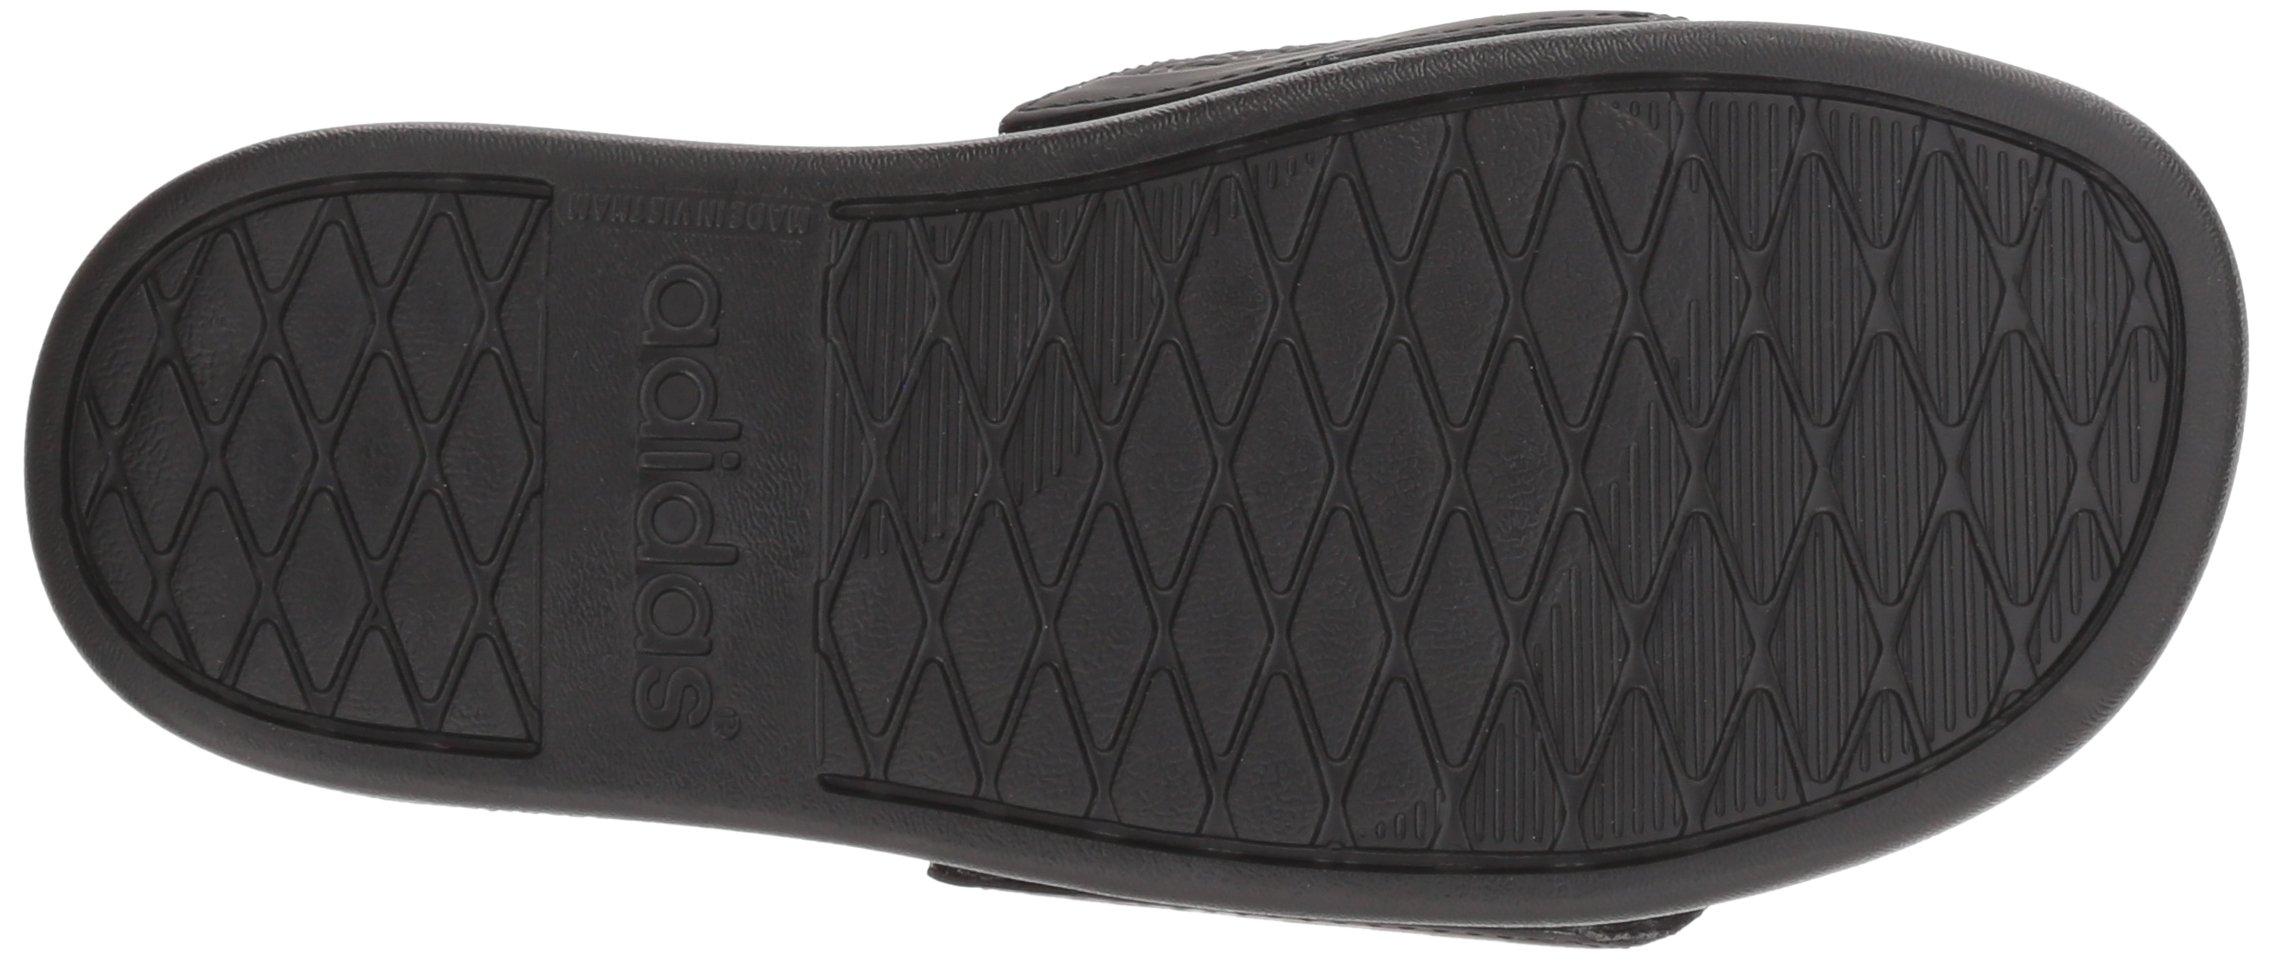 adidas Unisex-Kids Adilette Clf+ K Sandal,core black,White, core black,6 M US Big Kid by adidas (Image #3)